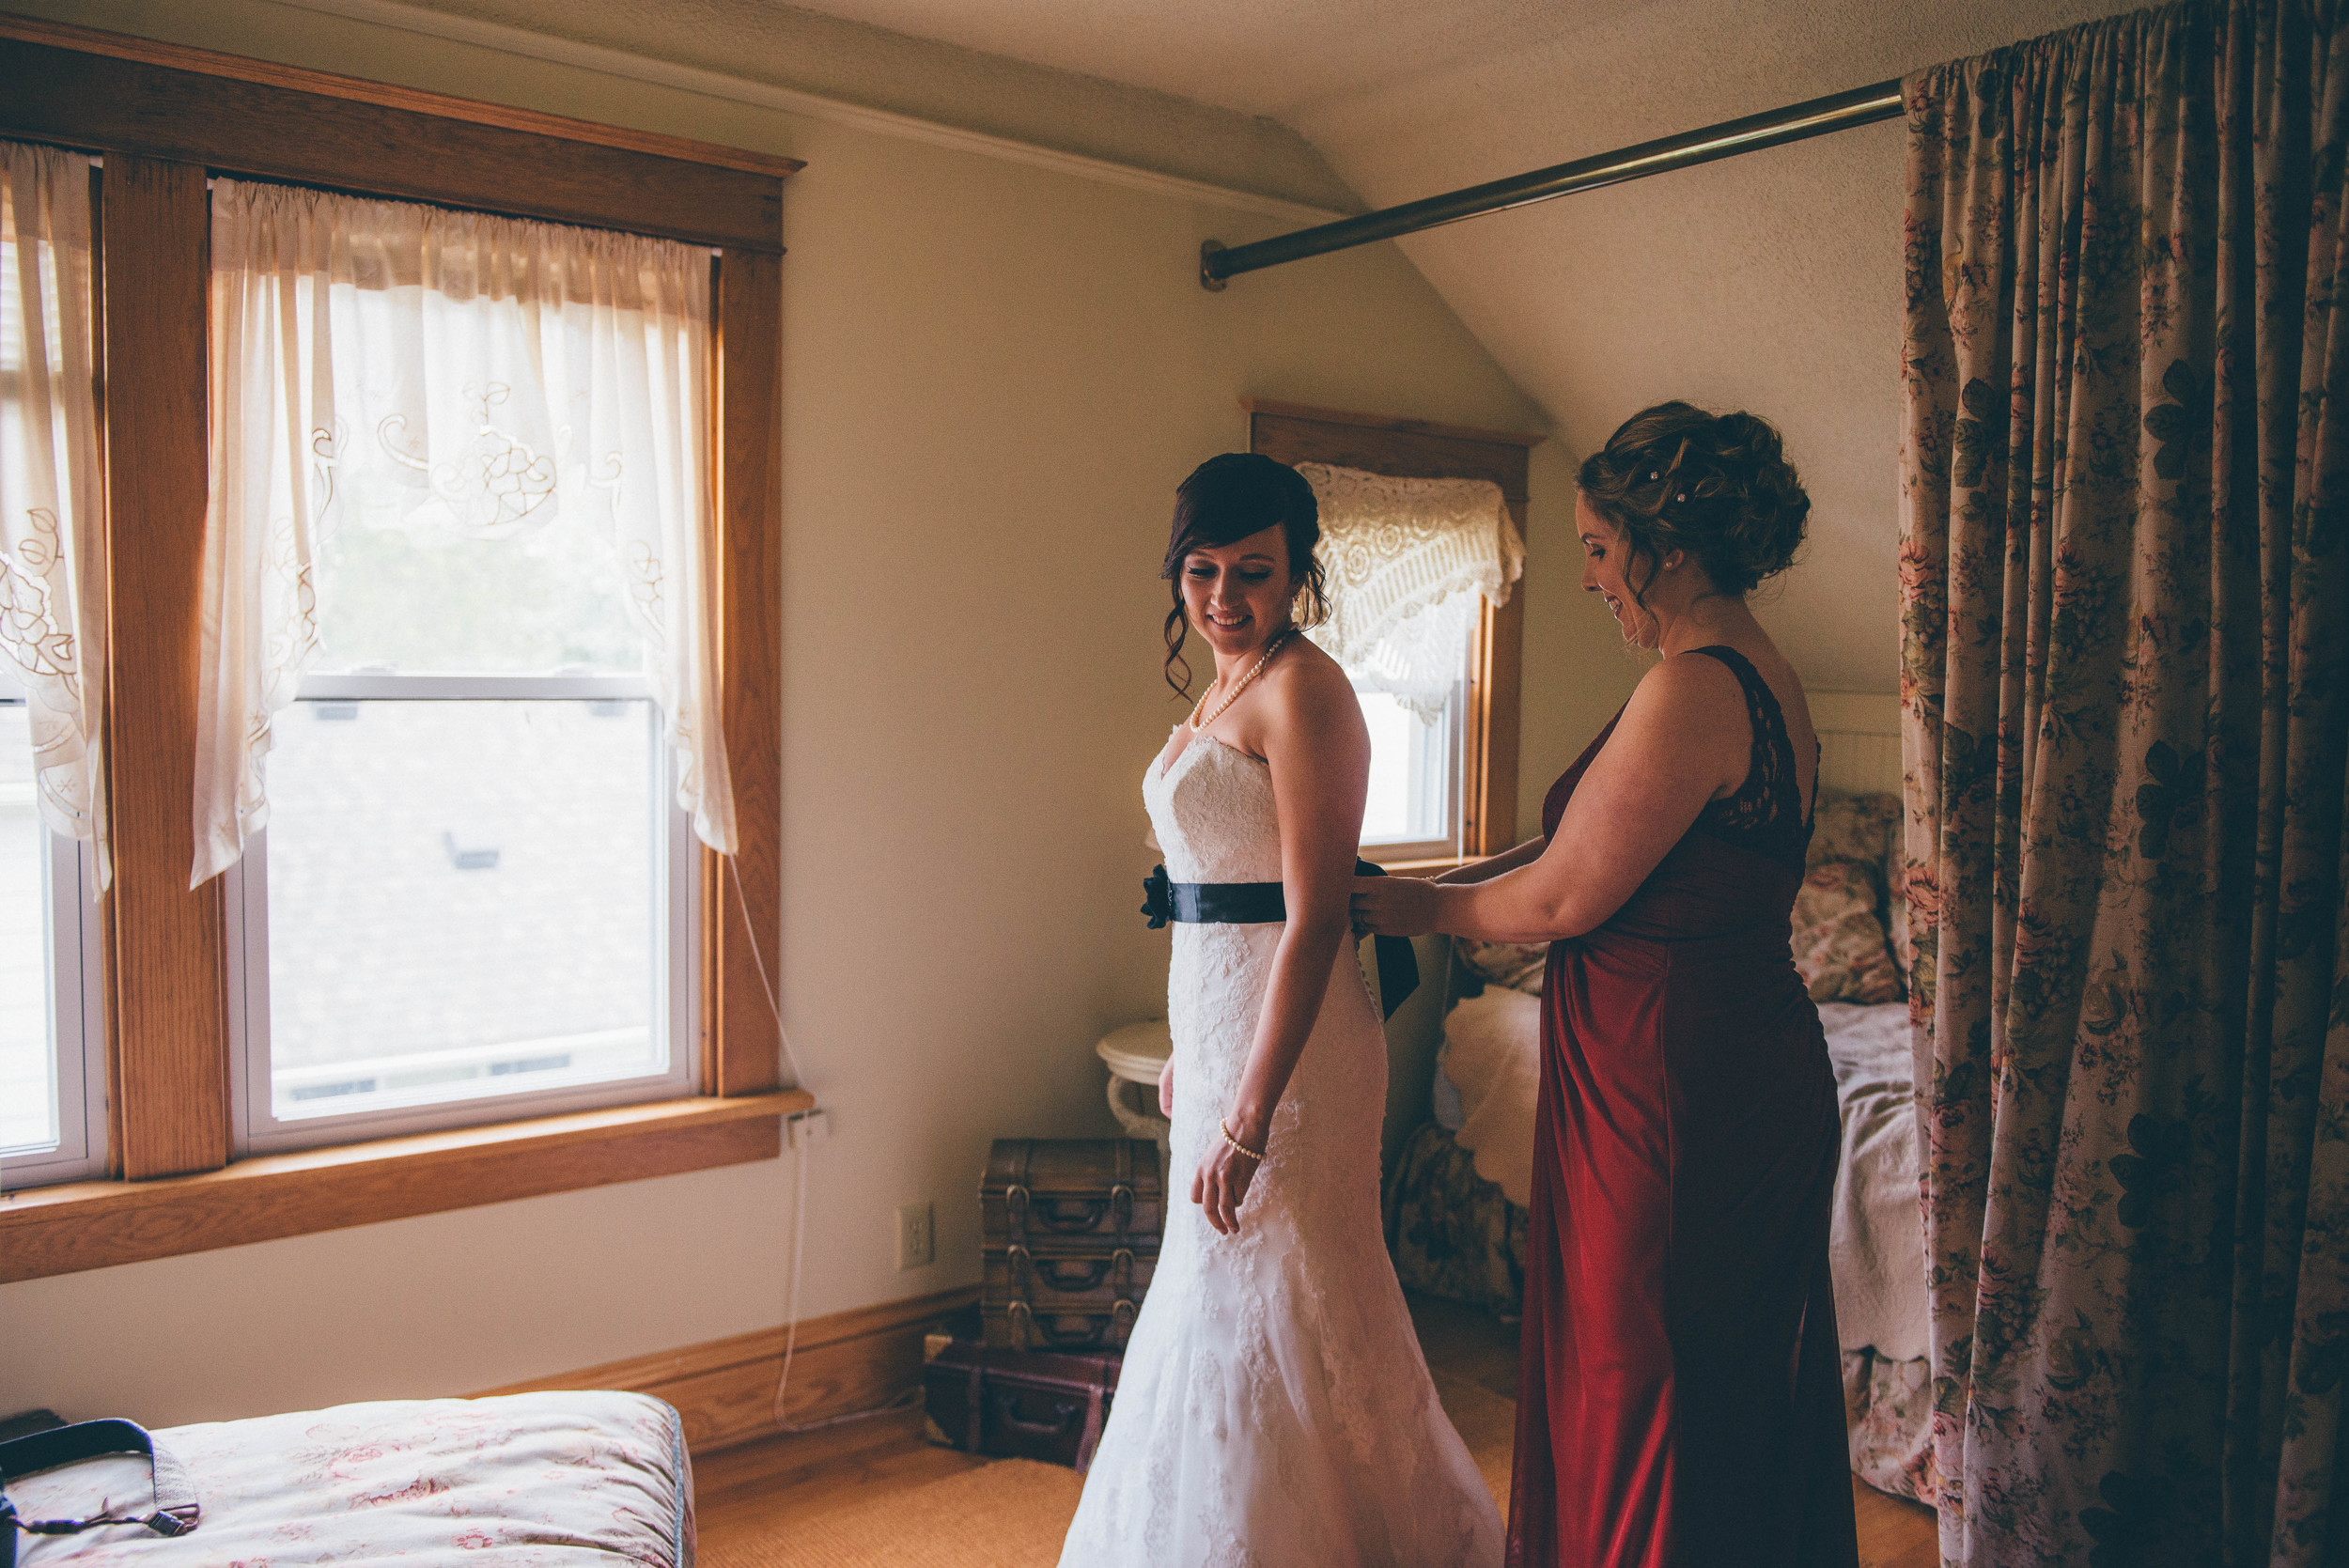 Michigan Vintage Wedding Venue   Miss Lyss Photography   www.misslyssphotography.com